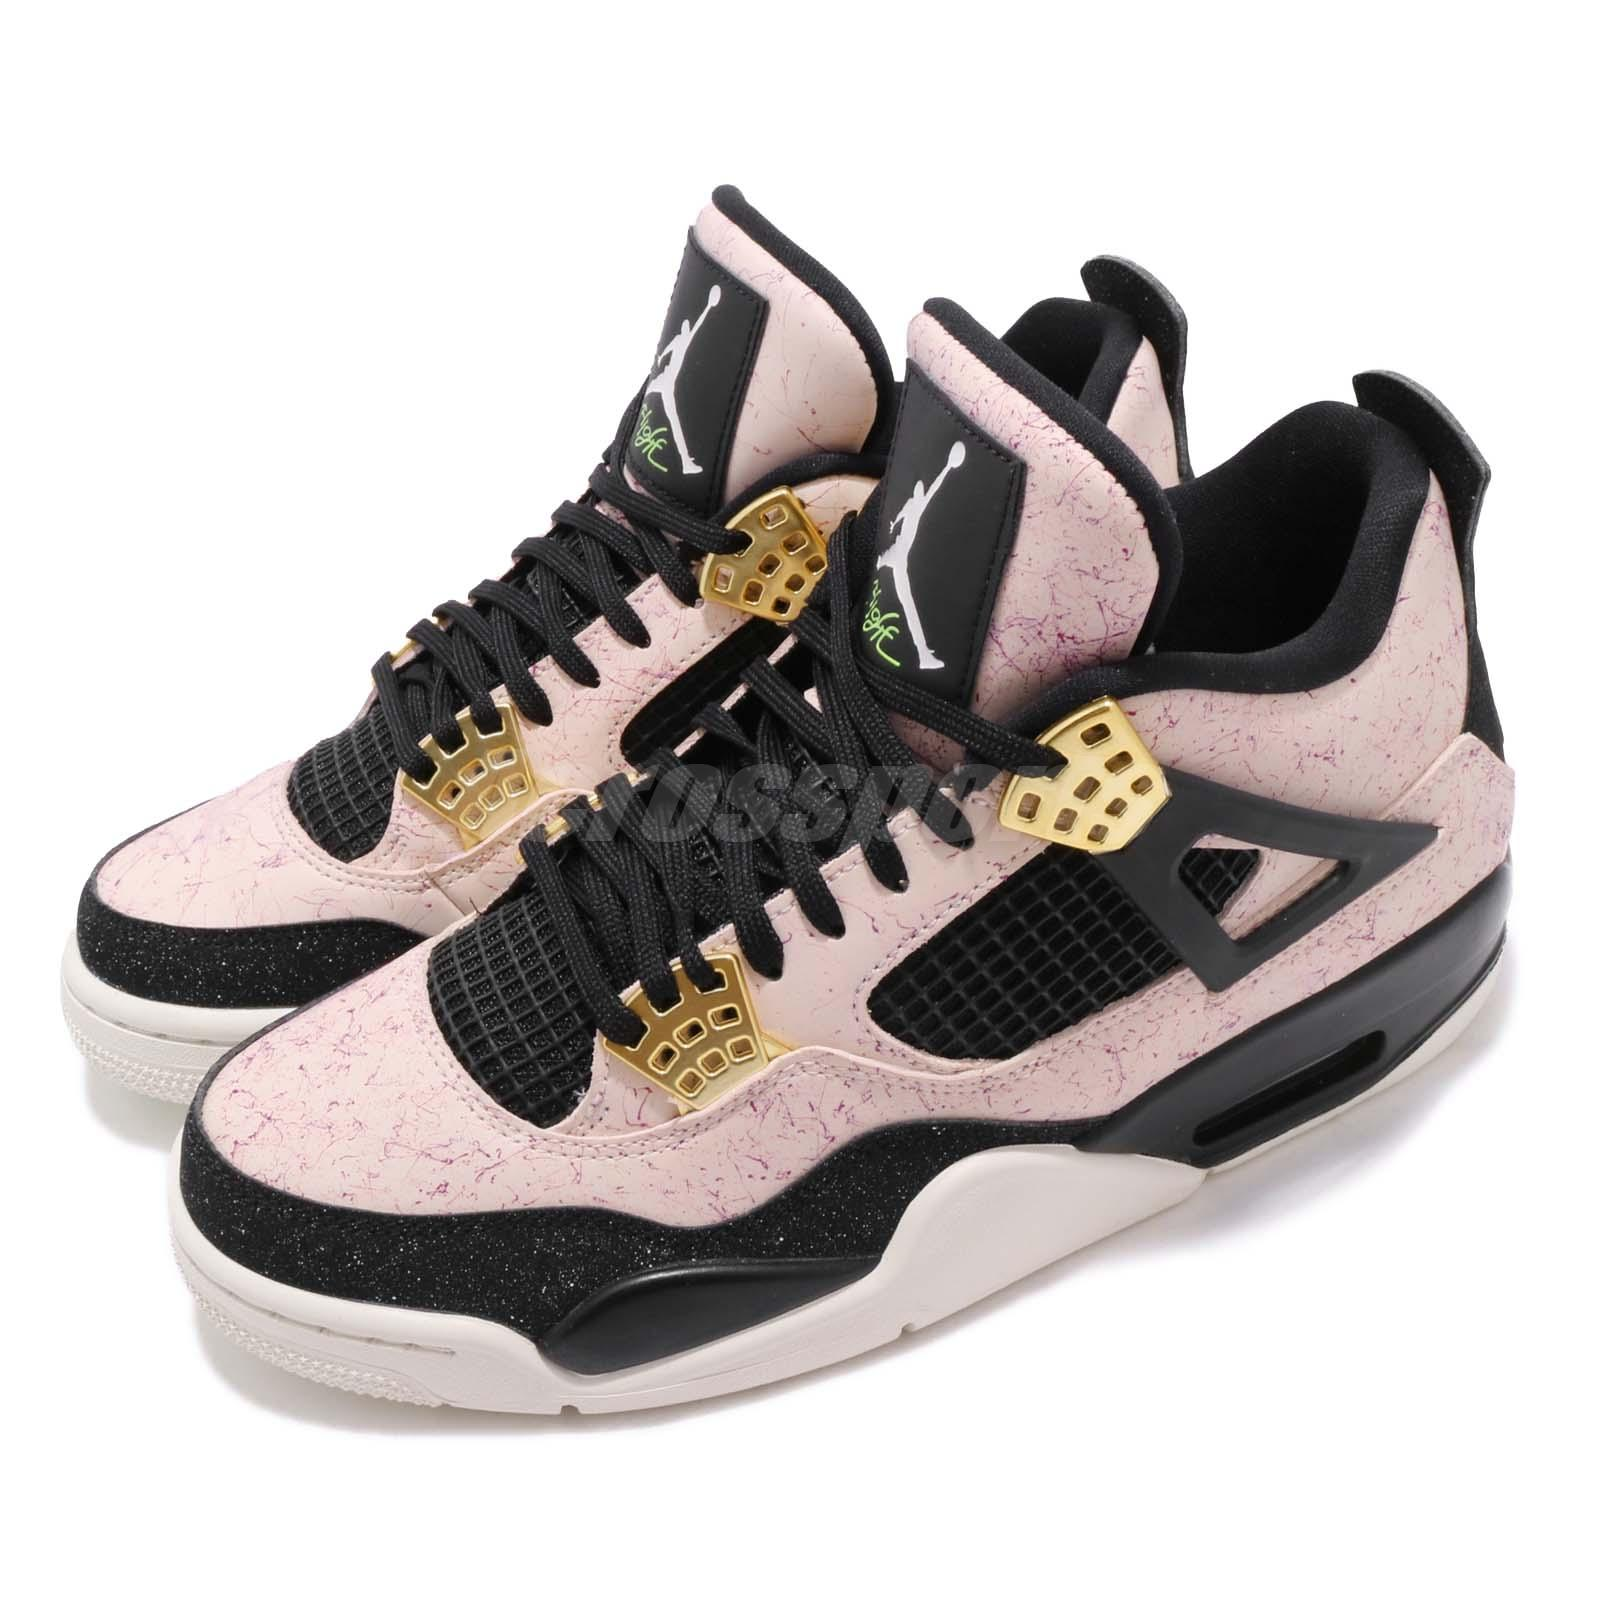 254d95bfff5 Details about Nike Wmns Air Jordan 4 Retro IV AJ4 Splatter Silt Red Women  Shoes AQ9129-601